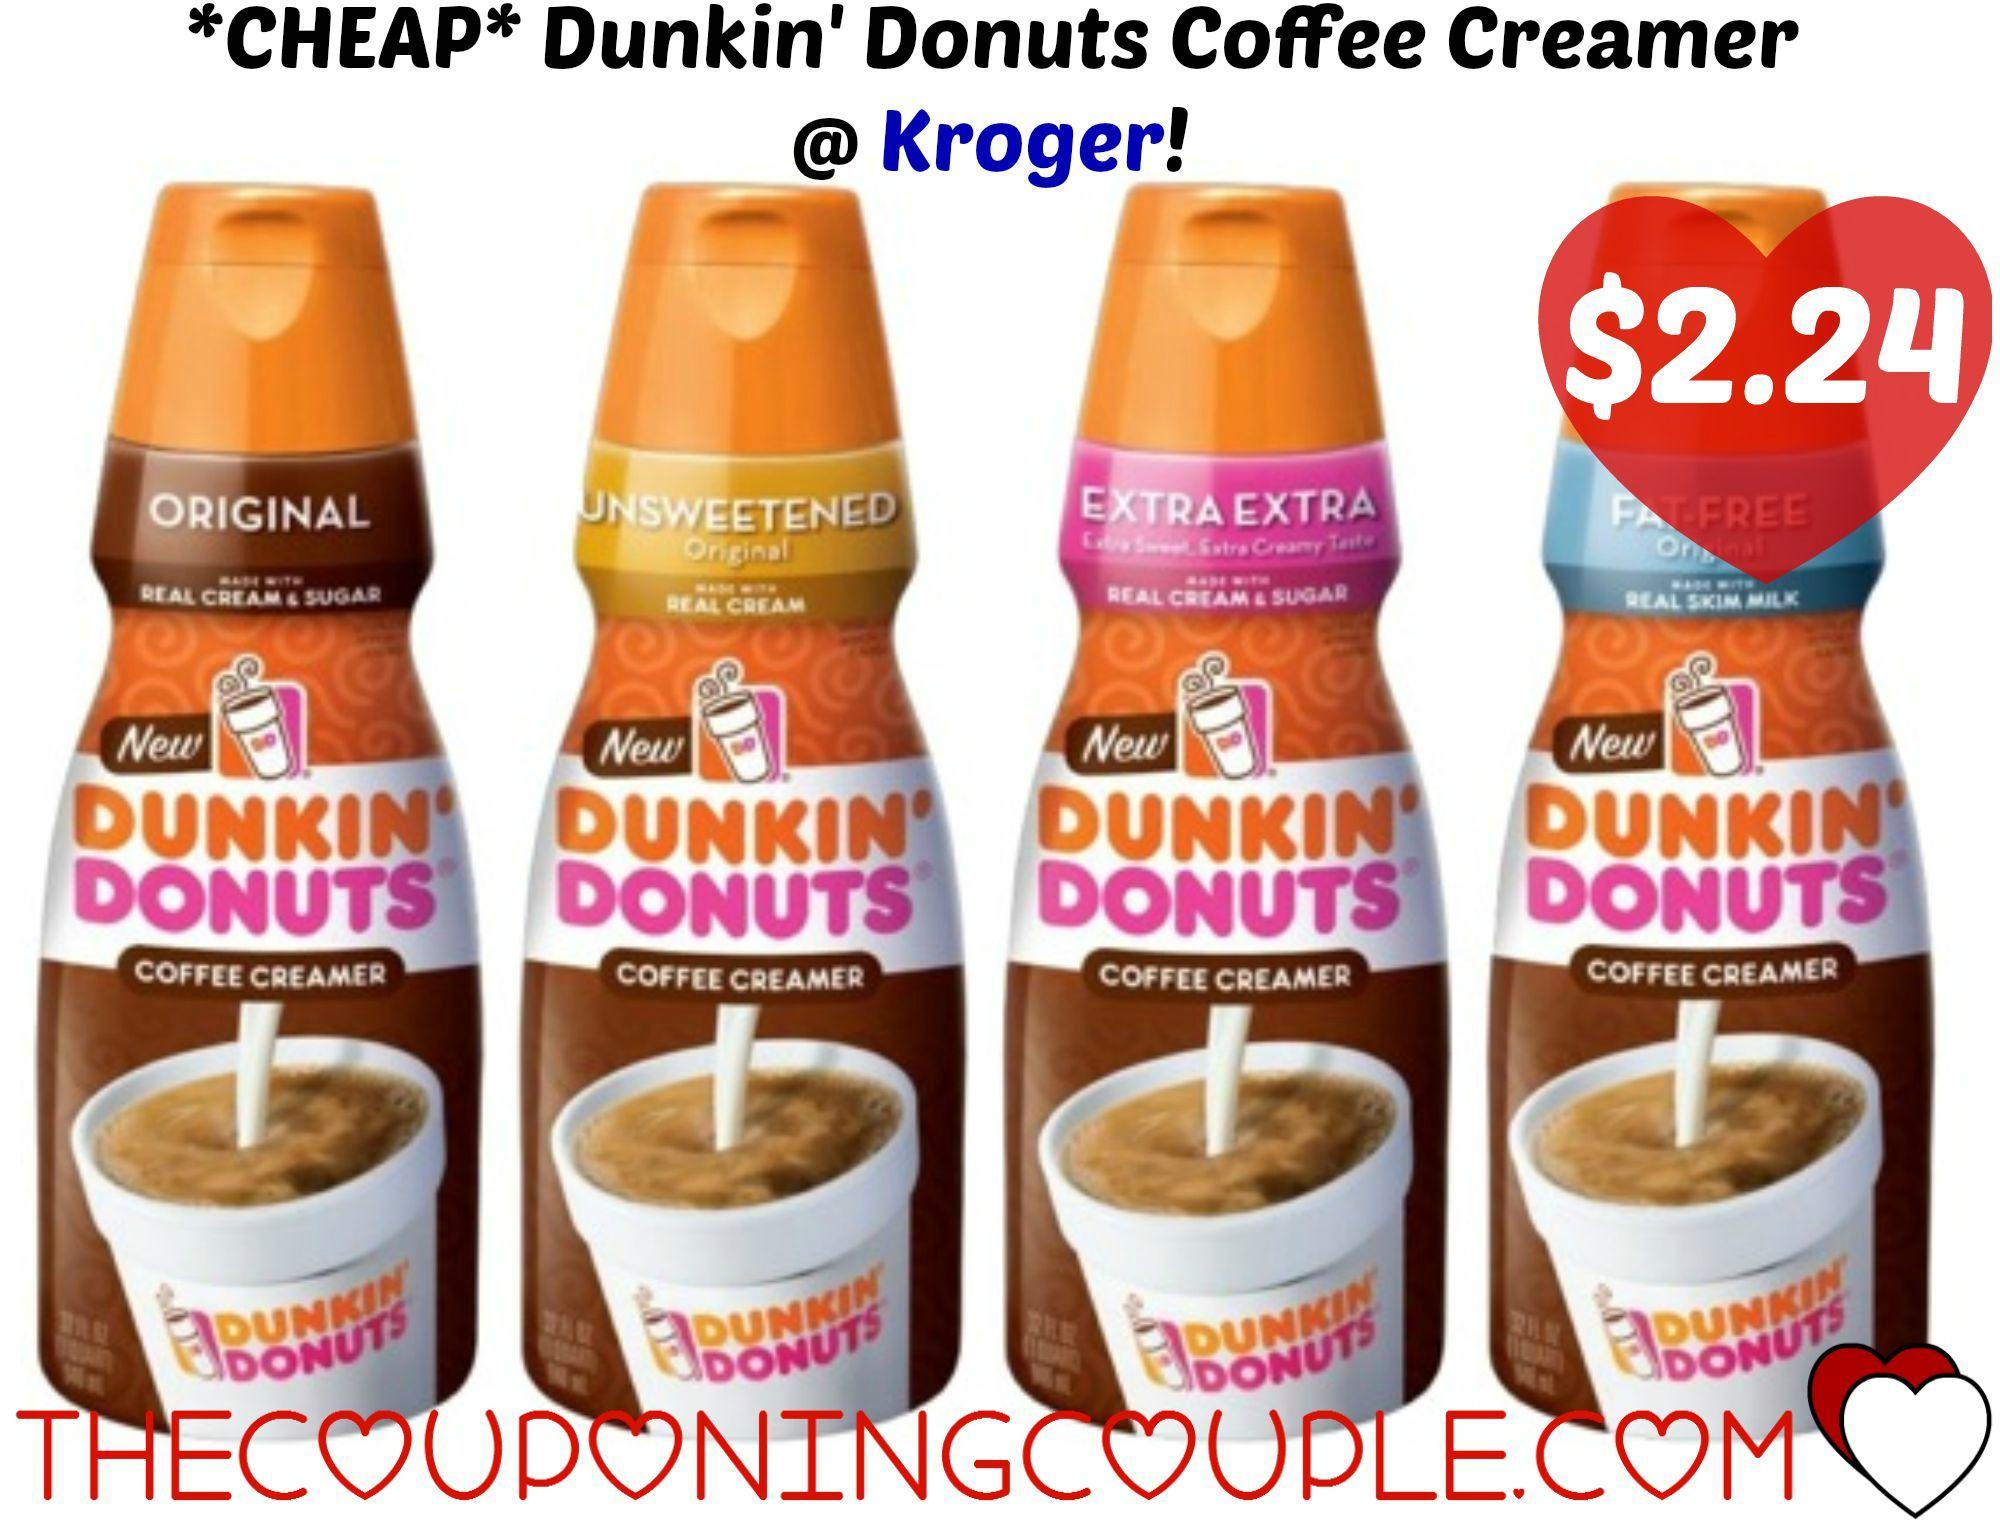 *CHEAP* Dunkin' Donuts Coffee Creamer Kroger Just 2.24